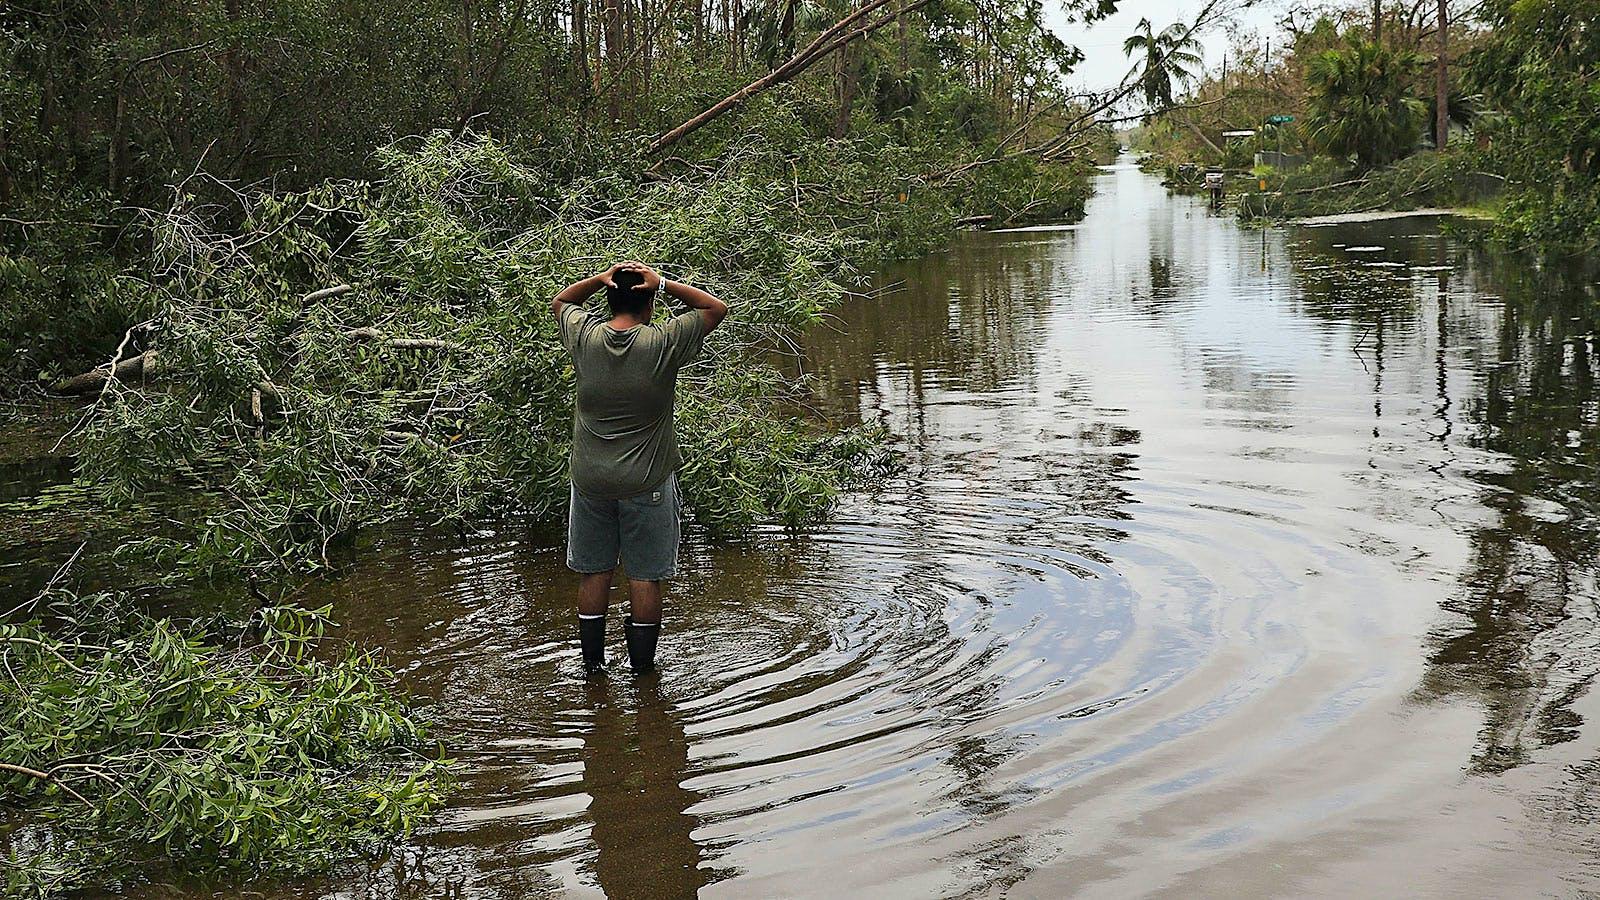 How Will Florida Restaurants Regroup After Irma's Devastation?